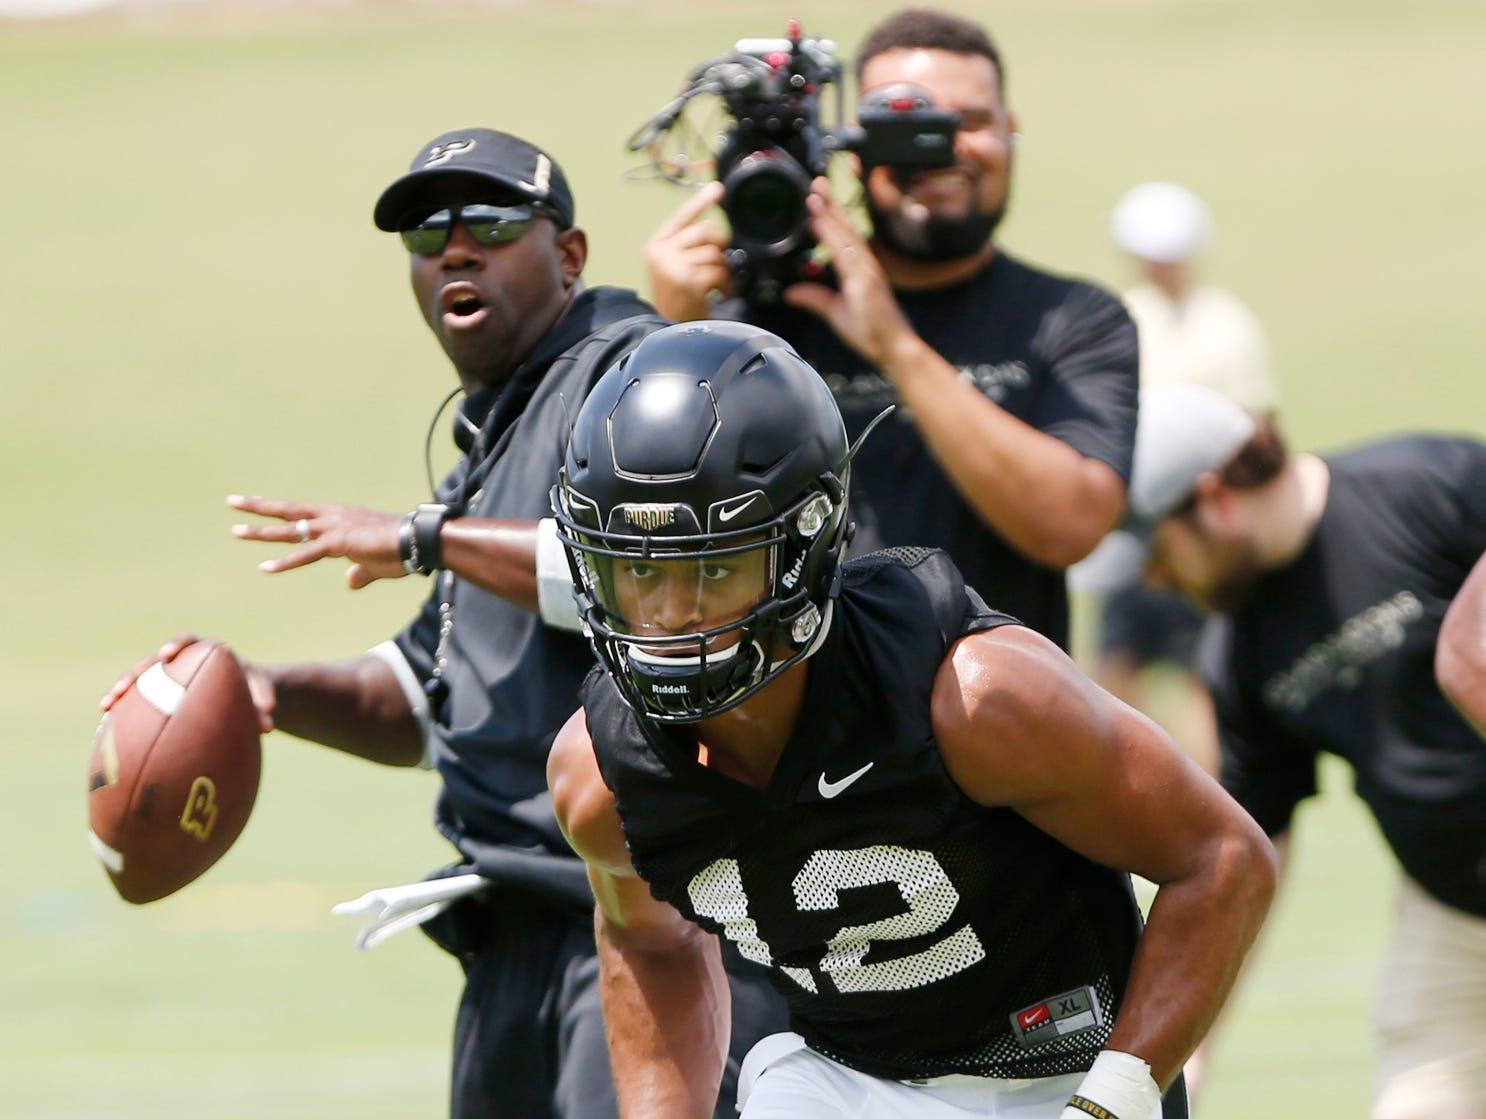 Purdue starting quarterback decision close; key players look to return